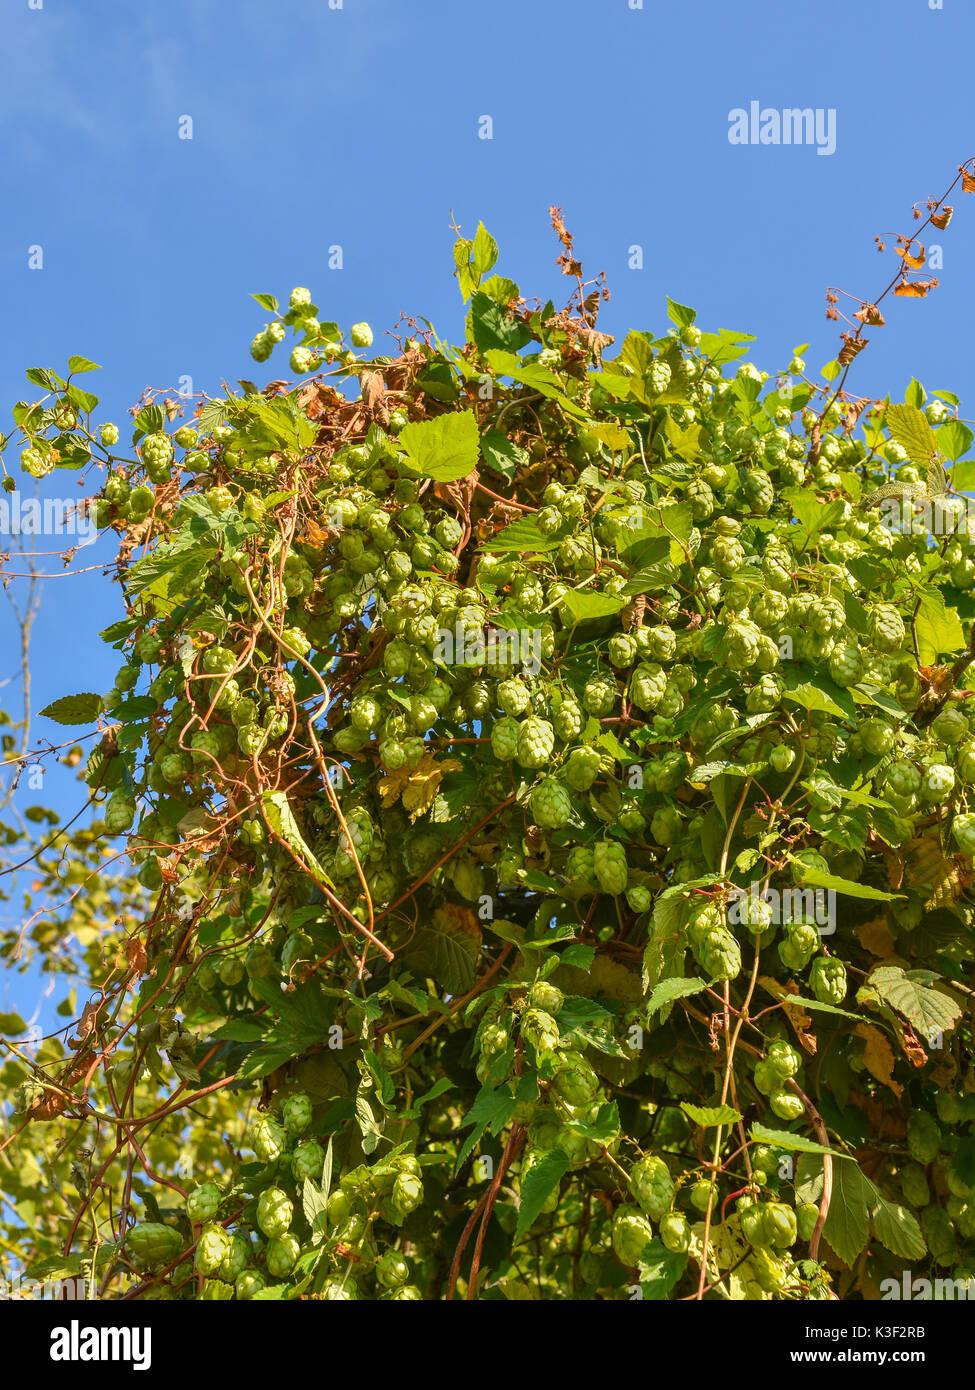 Wild Hop (Humulus lupulus) plant growing in roadside hedge - France. - Stock Image